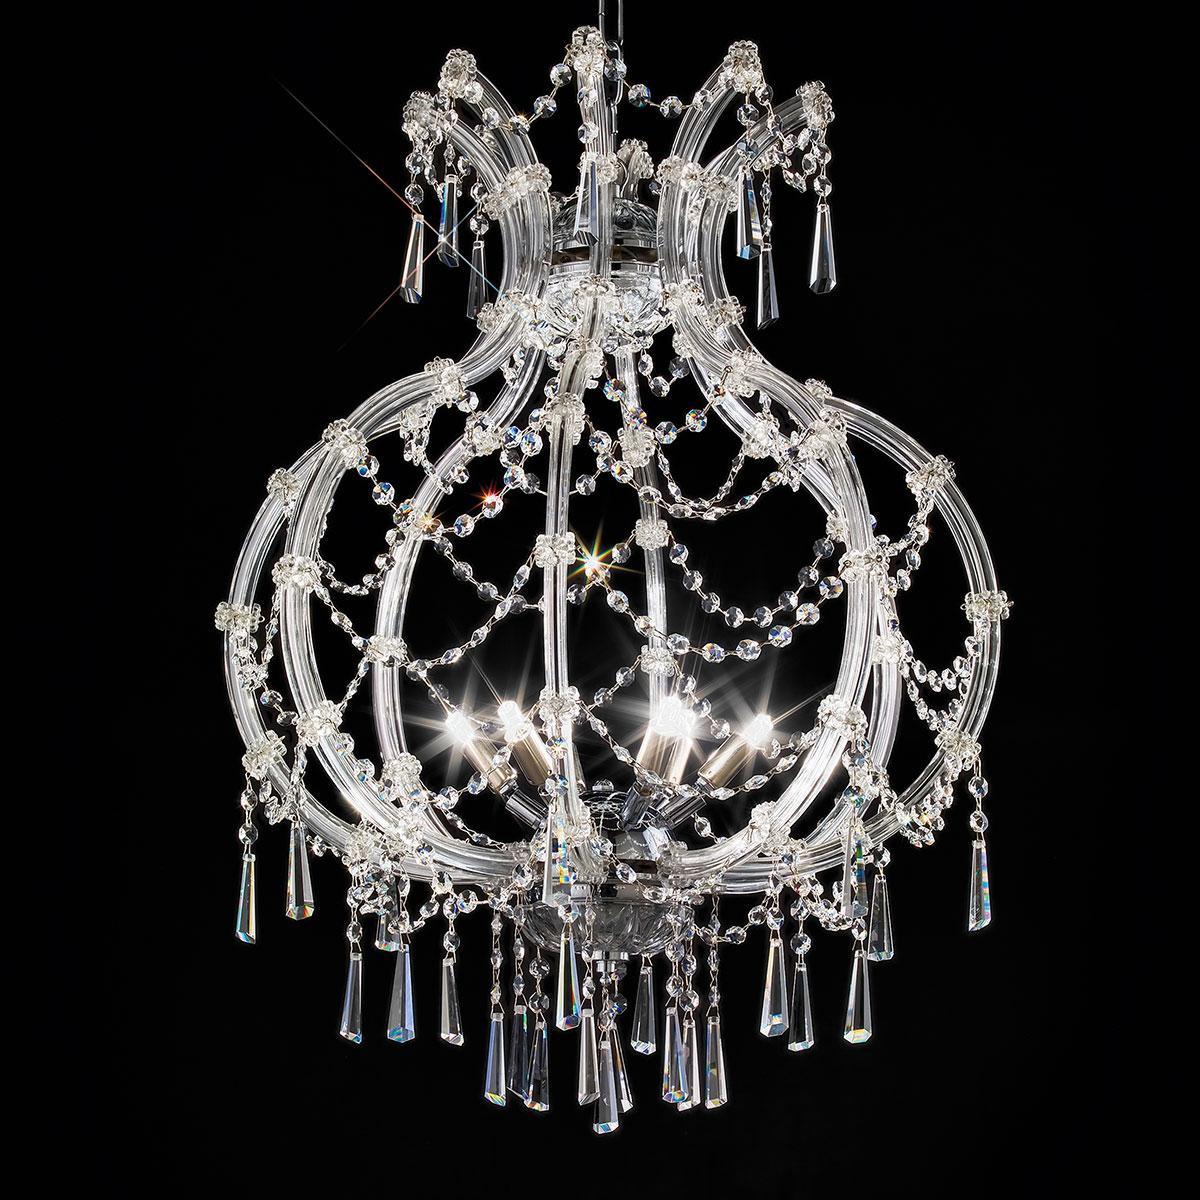 """Modigliani"" lámpara colgante veneciana en cristal - 6 luces - transparente con cristal Asfour"